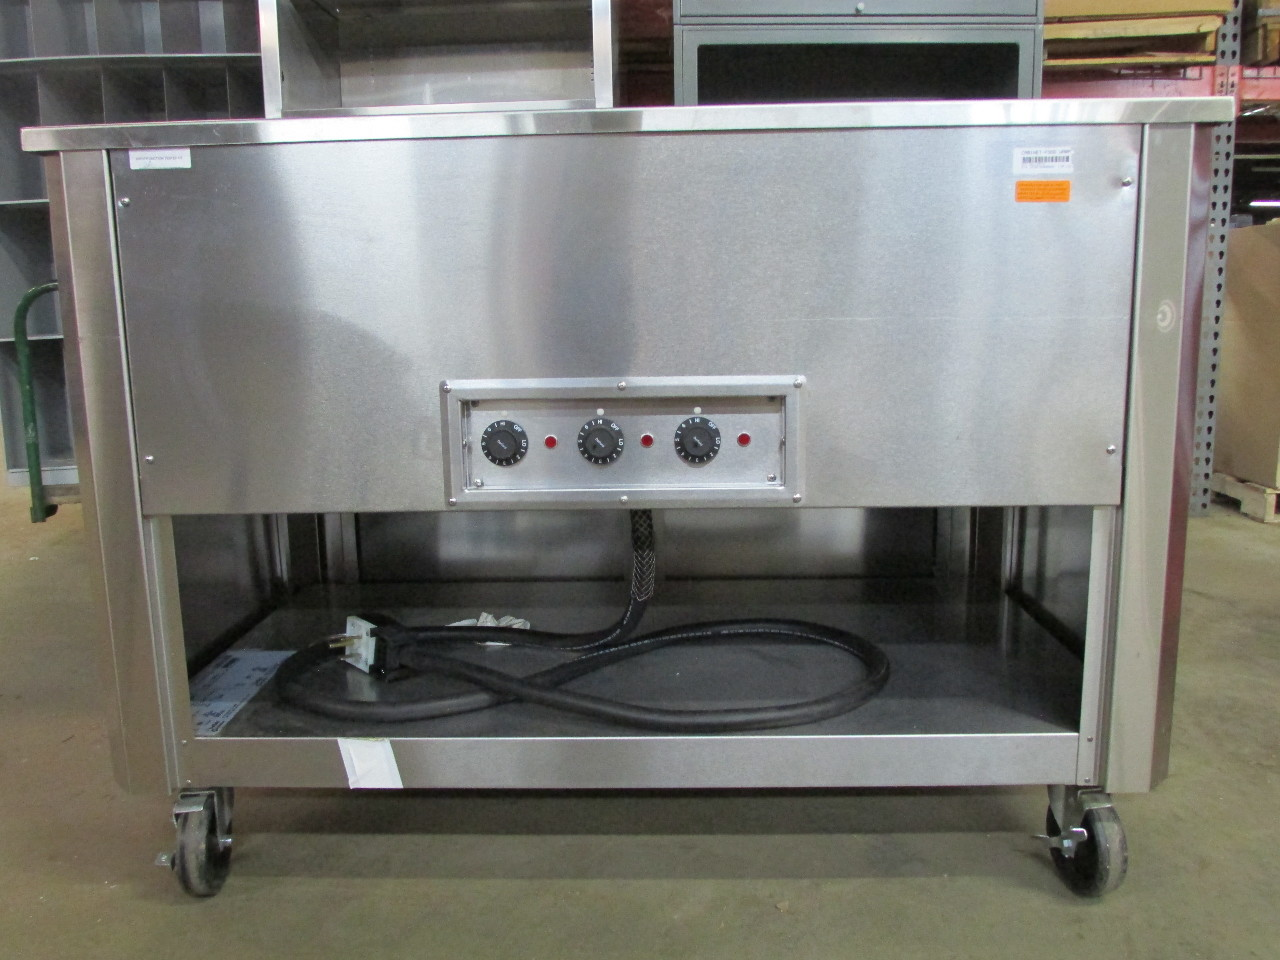 Delfield Manitowoc Food Warming Cabinet N8745 Restaurant